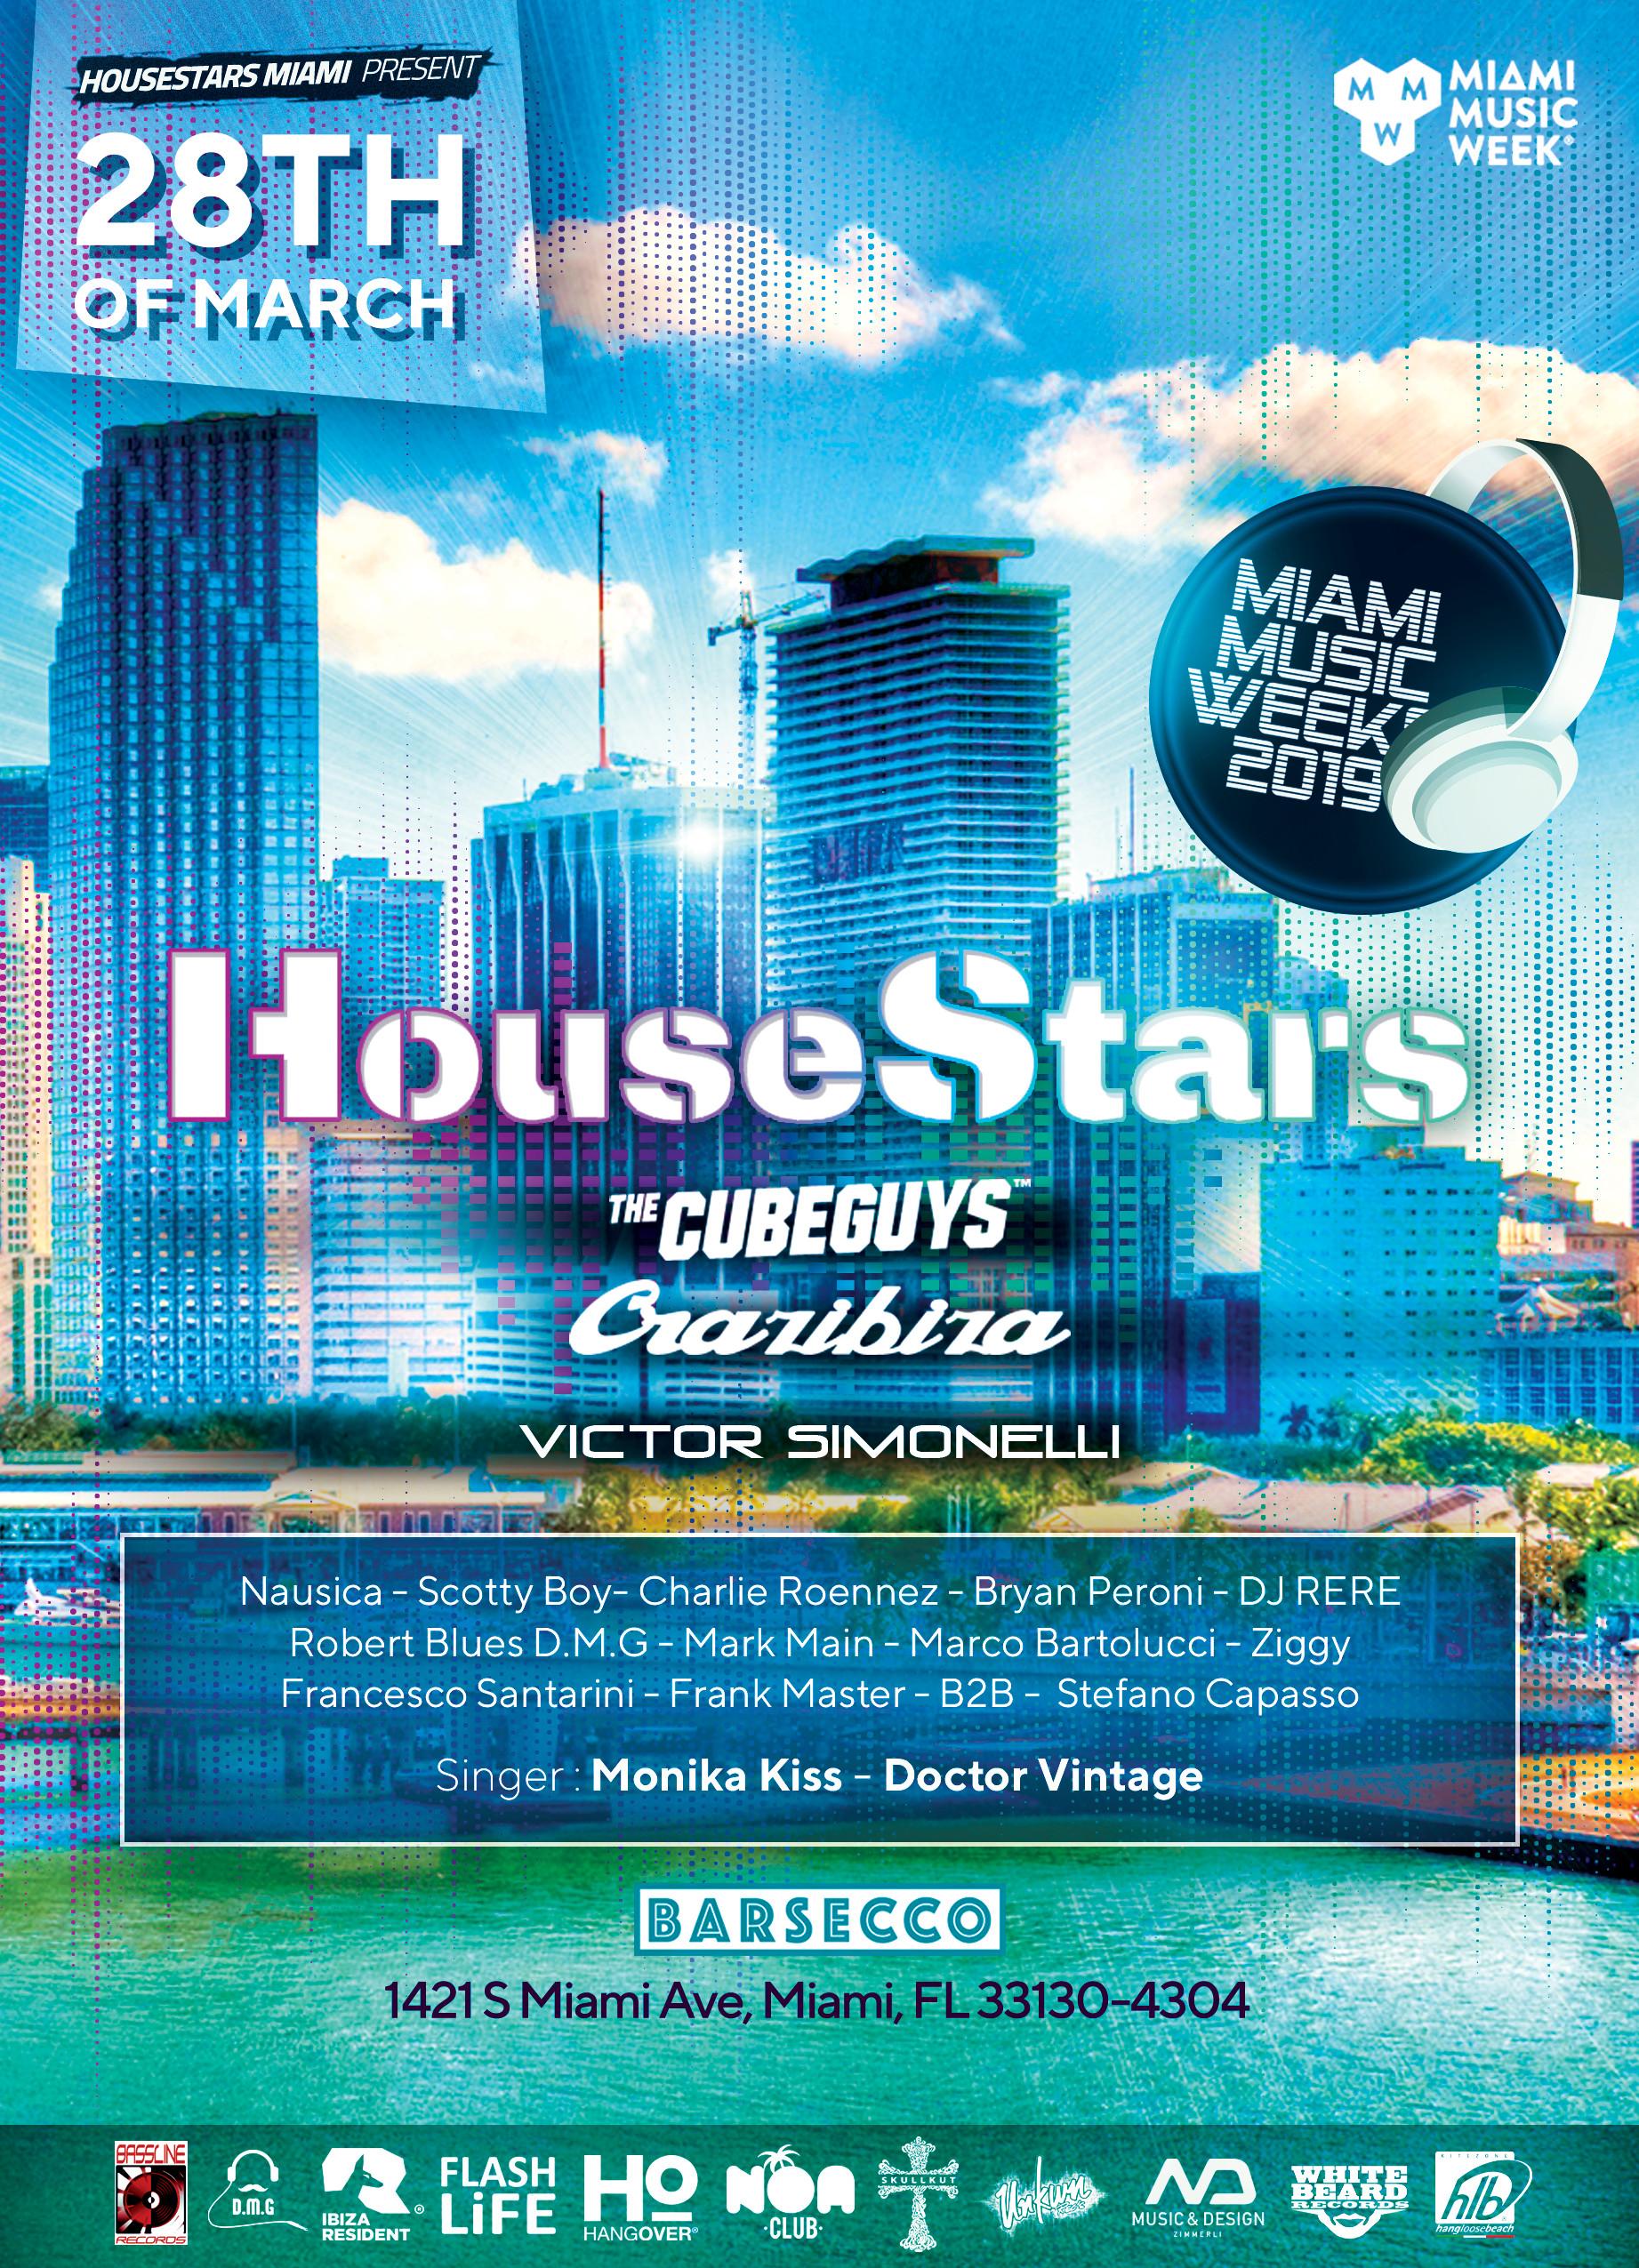 House Stars Image